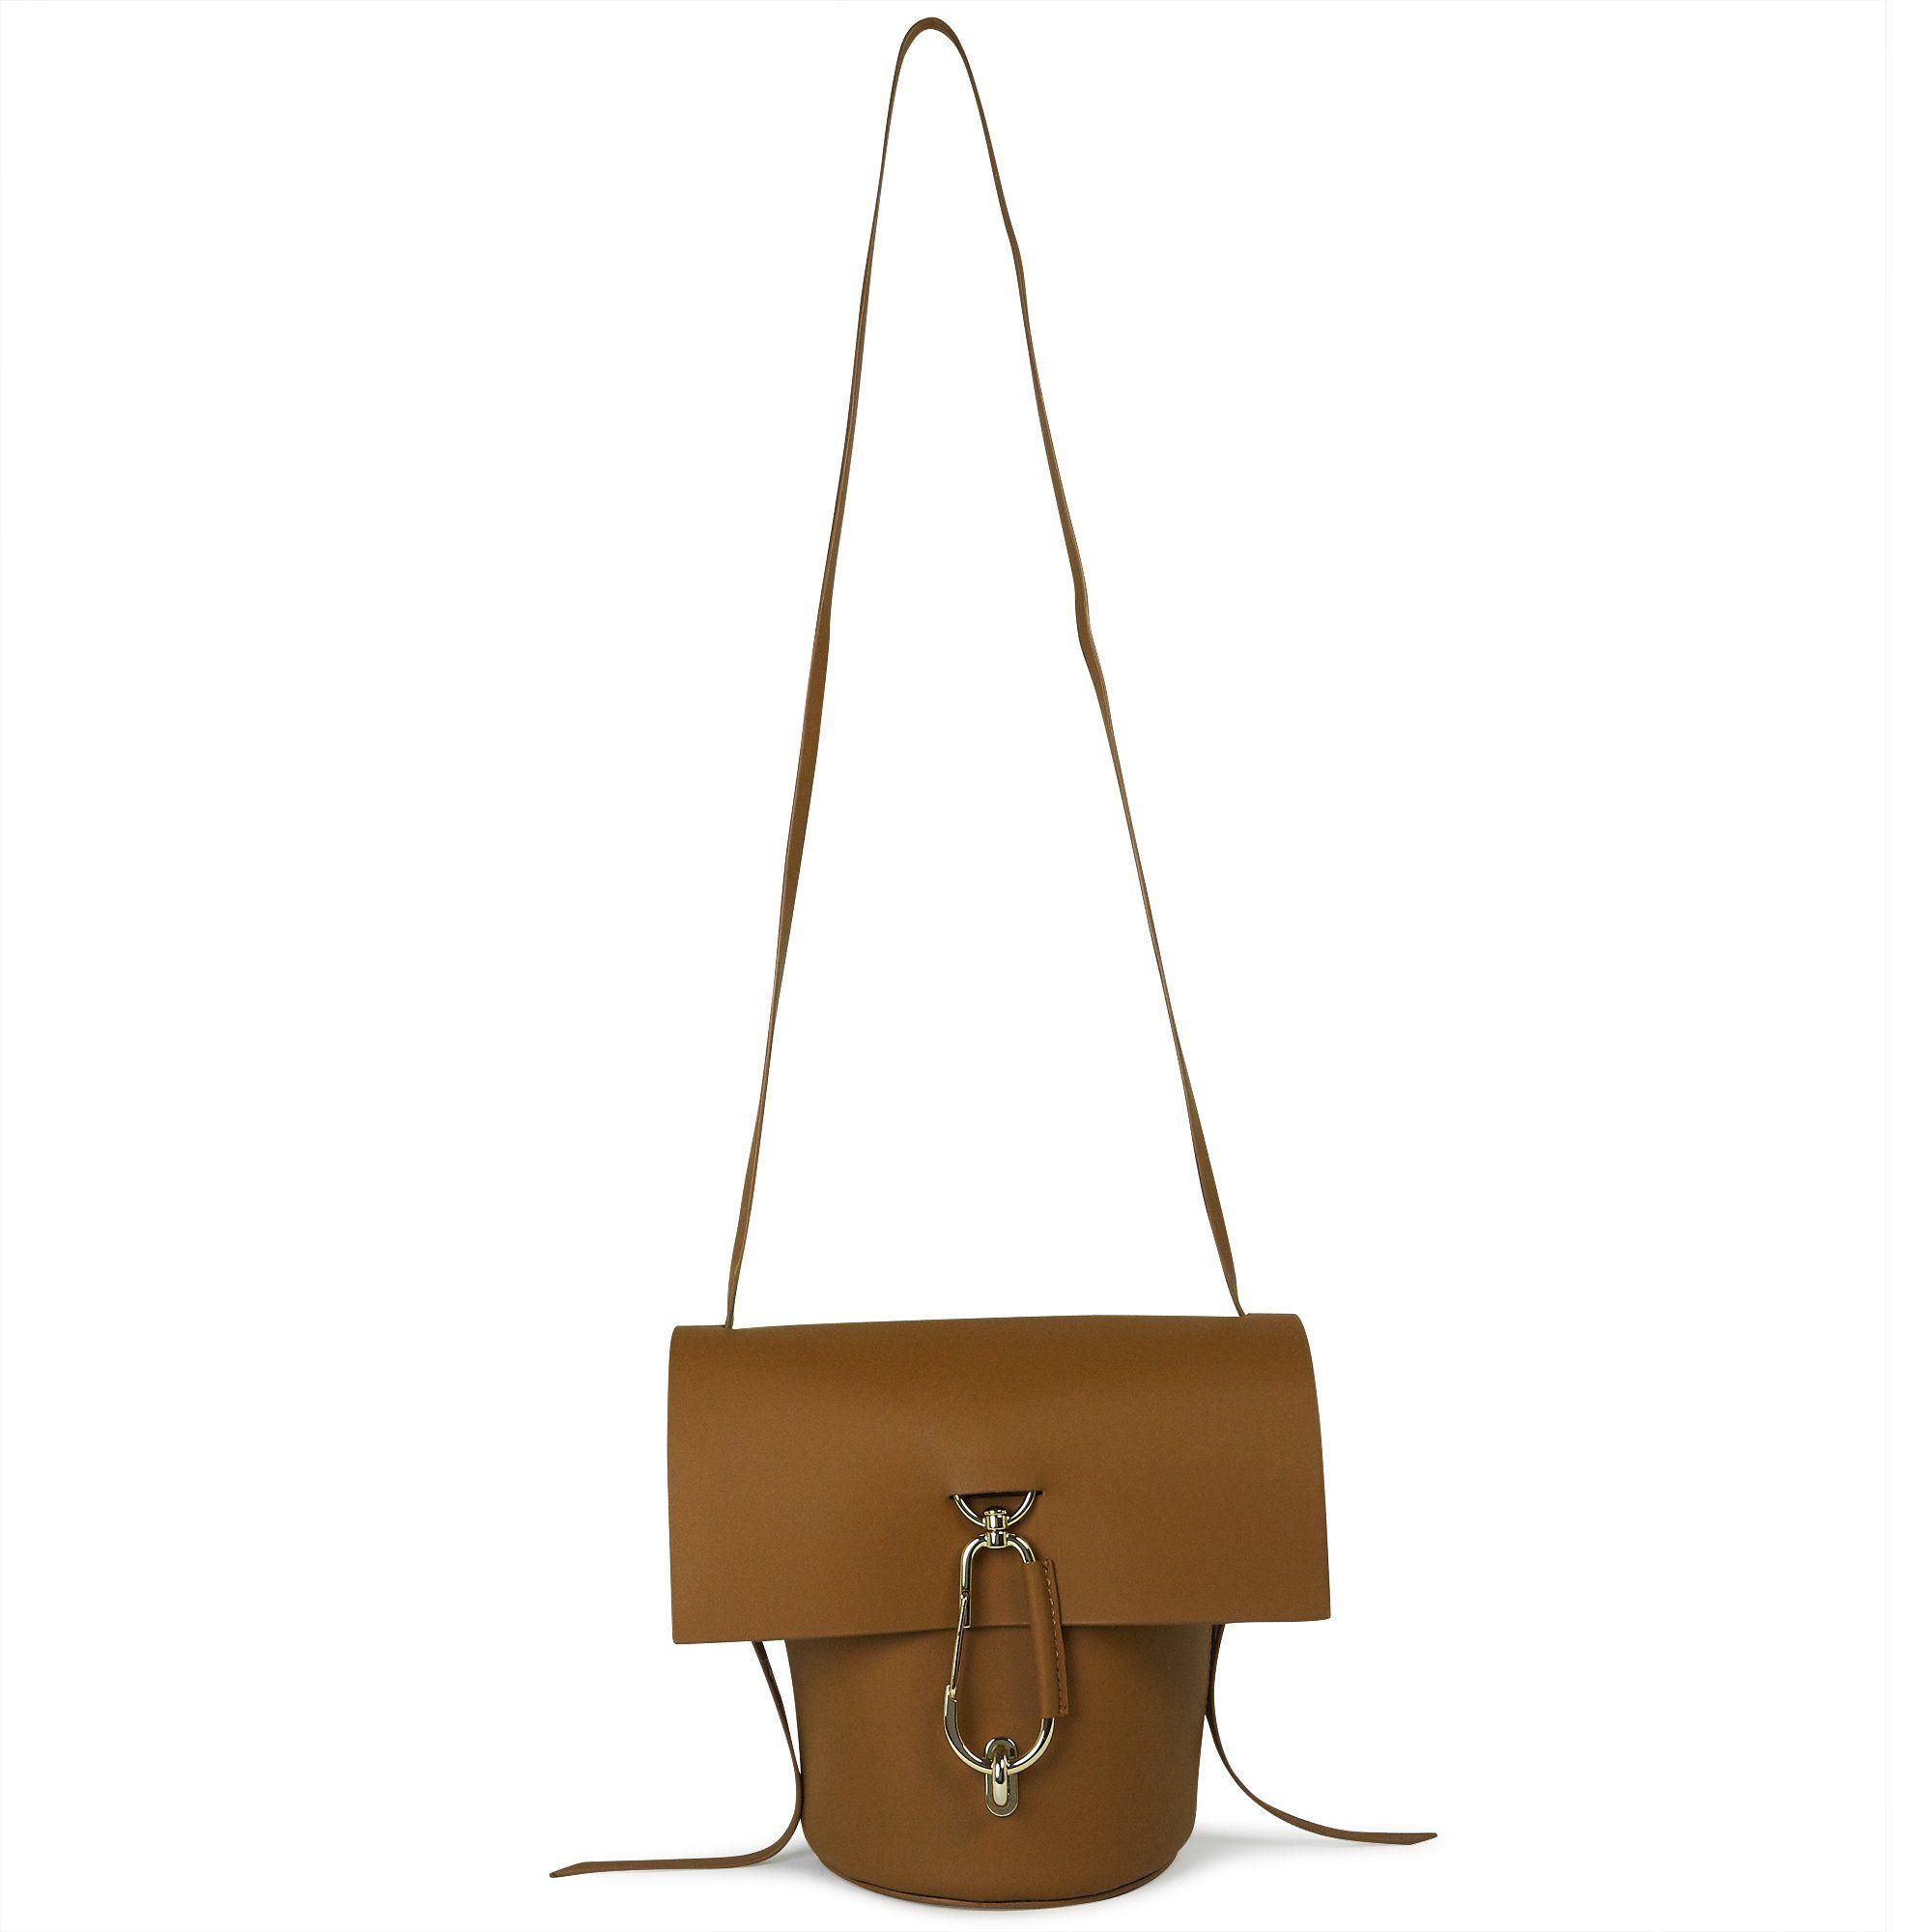 Zeck Shoulder Bag M Angeltasche 37x23x20cm